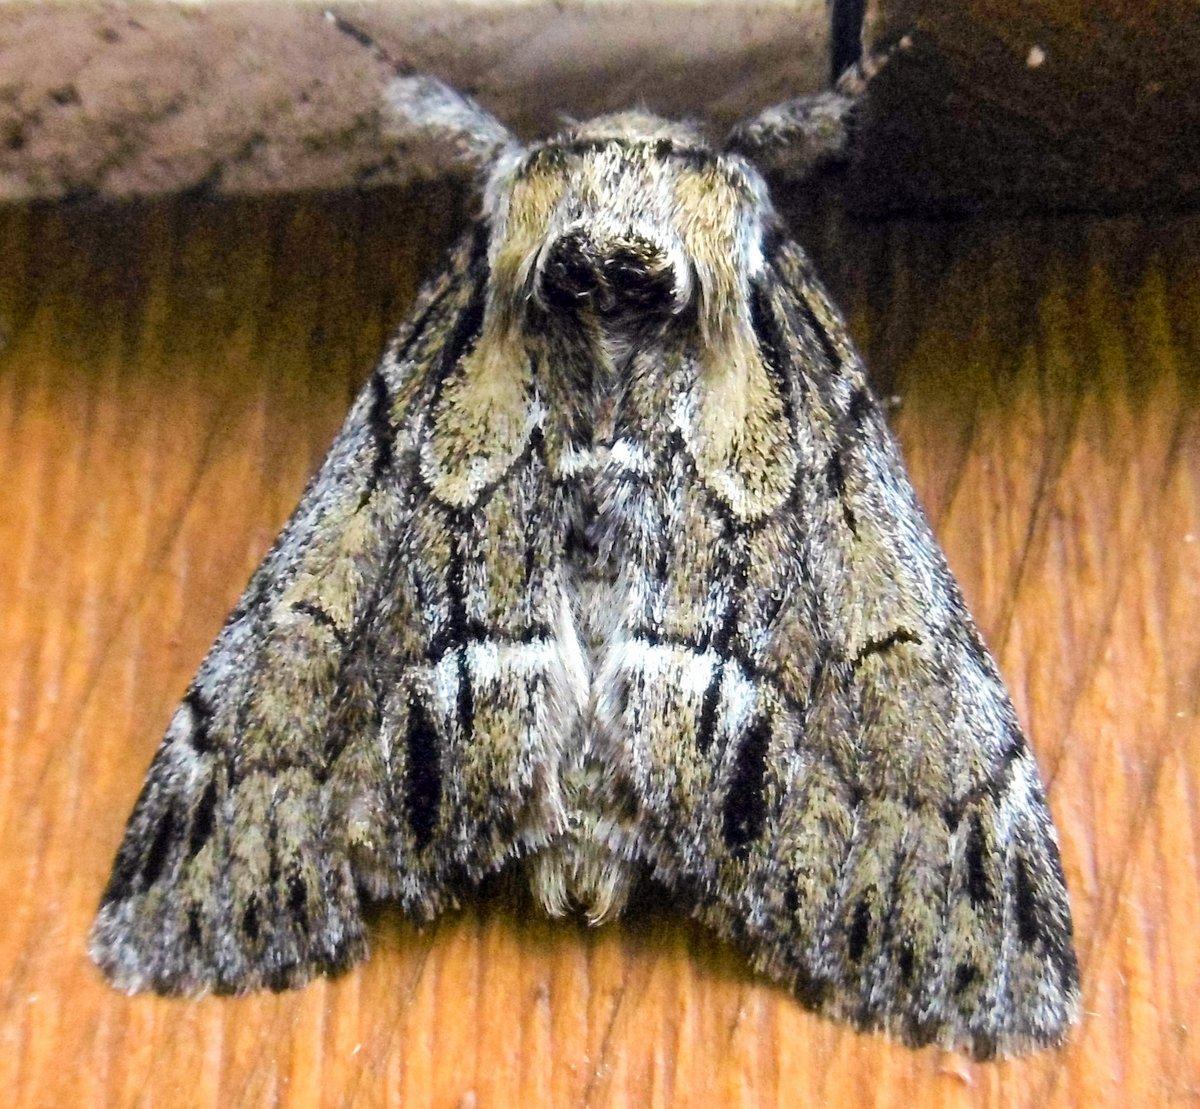 16. Moth